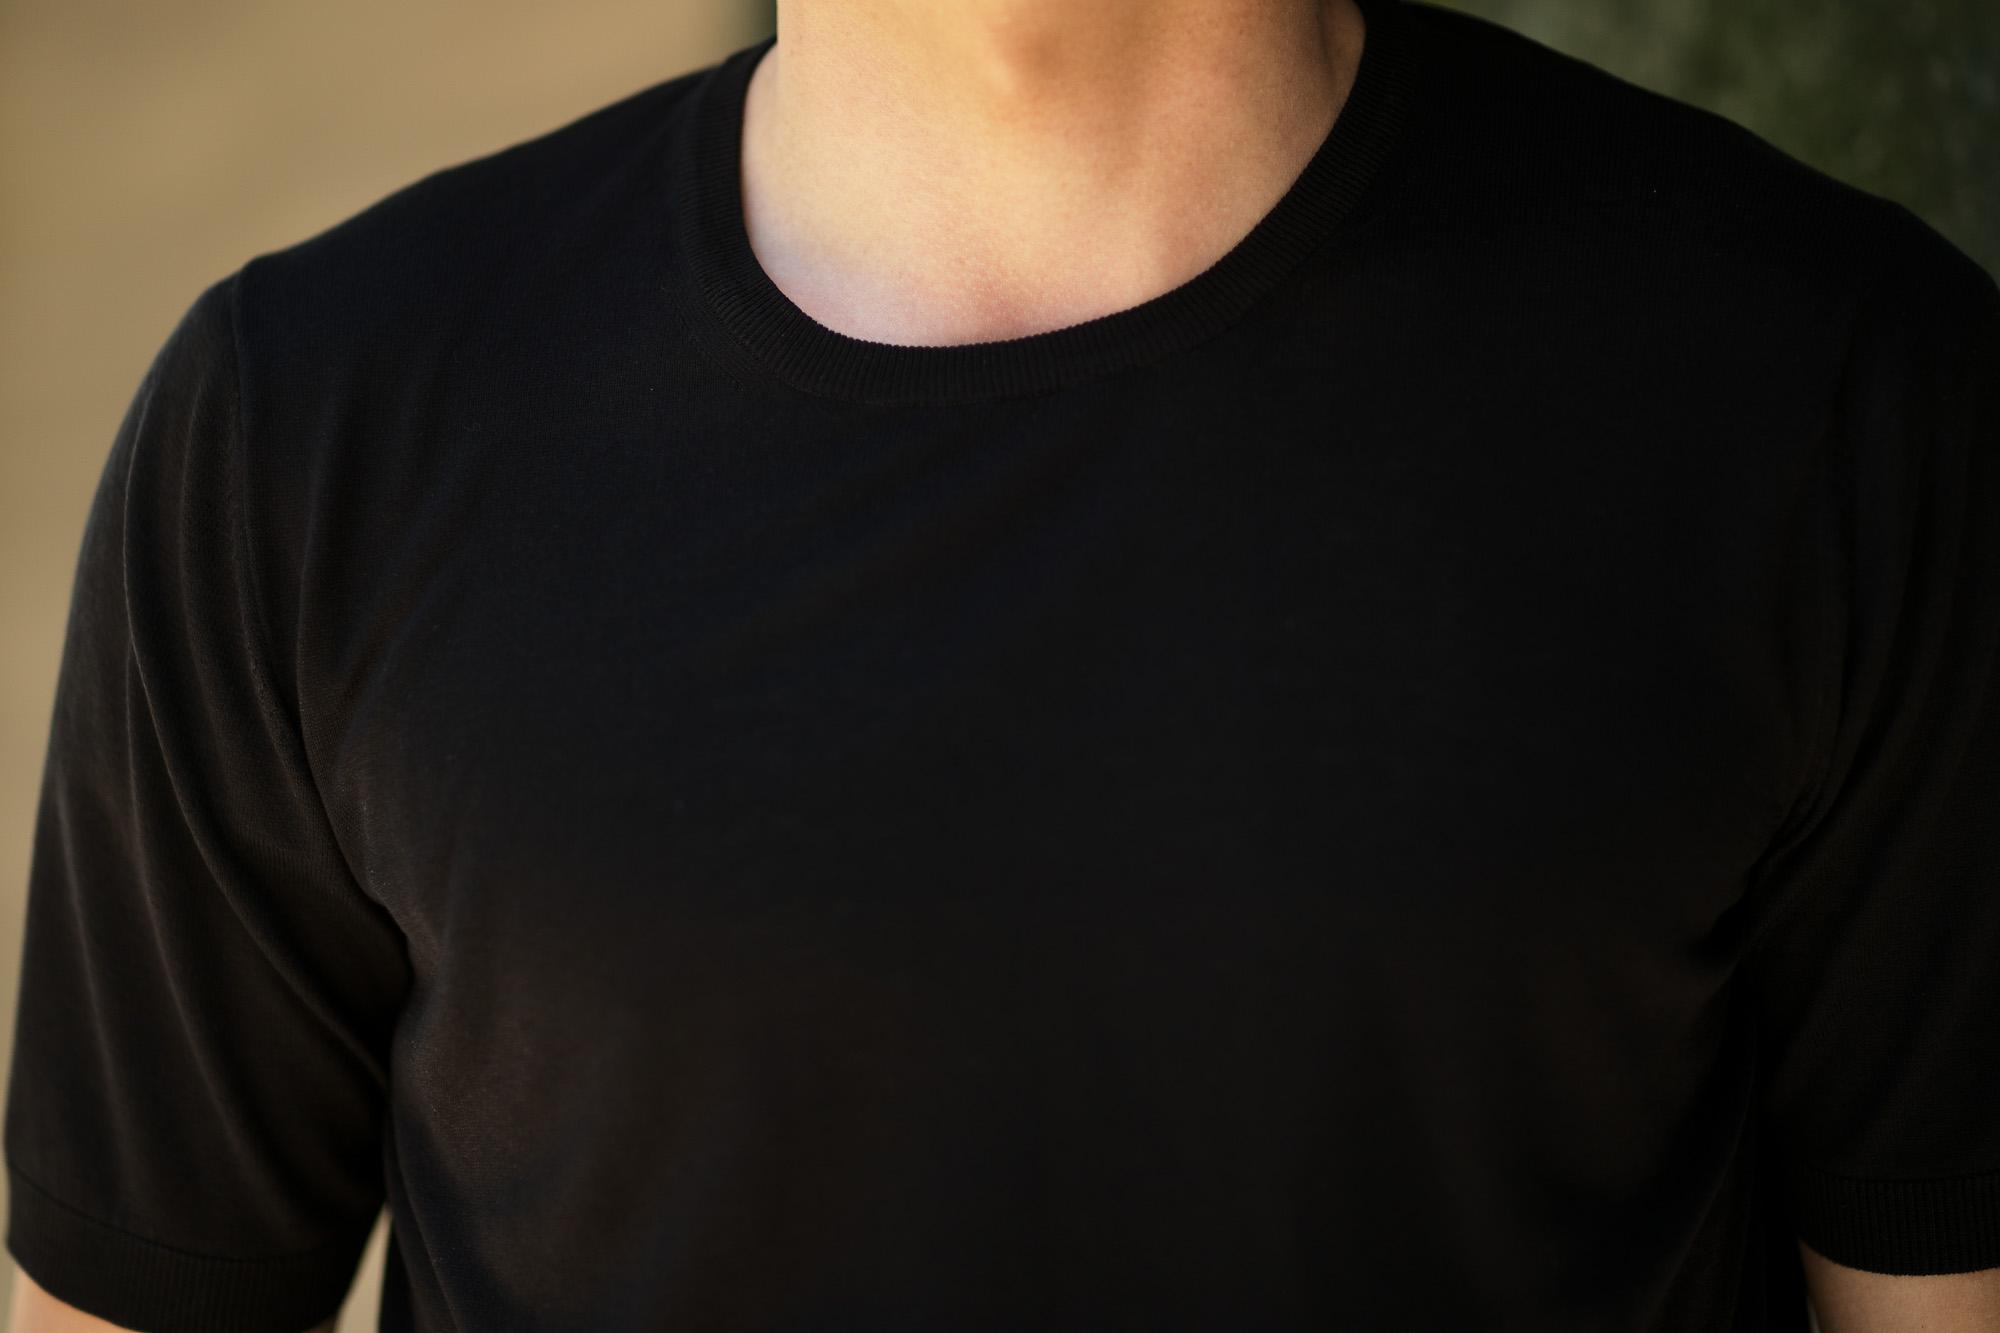 Gran Sasso (グランサッソ) Silk Knit T-shirt (シルクニット Tシャツ) SETA (シルク 100%) ショートスリーブ シルク ニット Tシャツ BLACK (ブラック・099) made in italy (イタリア製) 2019 春夏新作 gransasso 愛知 名古屋 altoediritto アルトエデリット